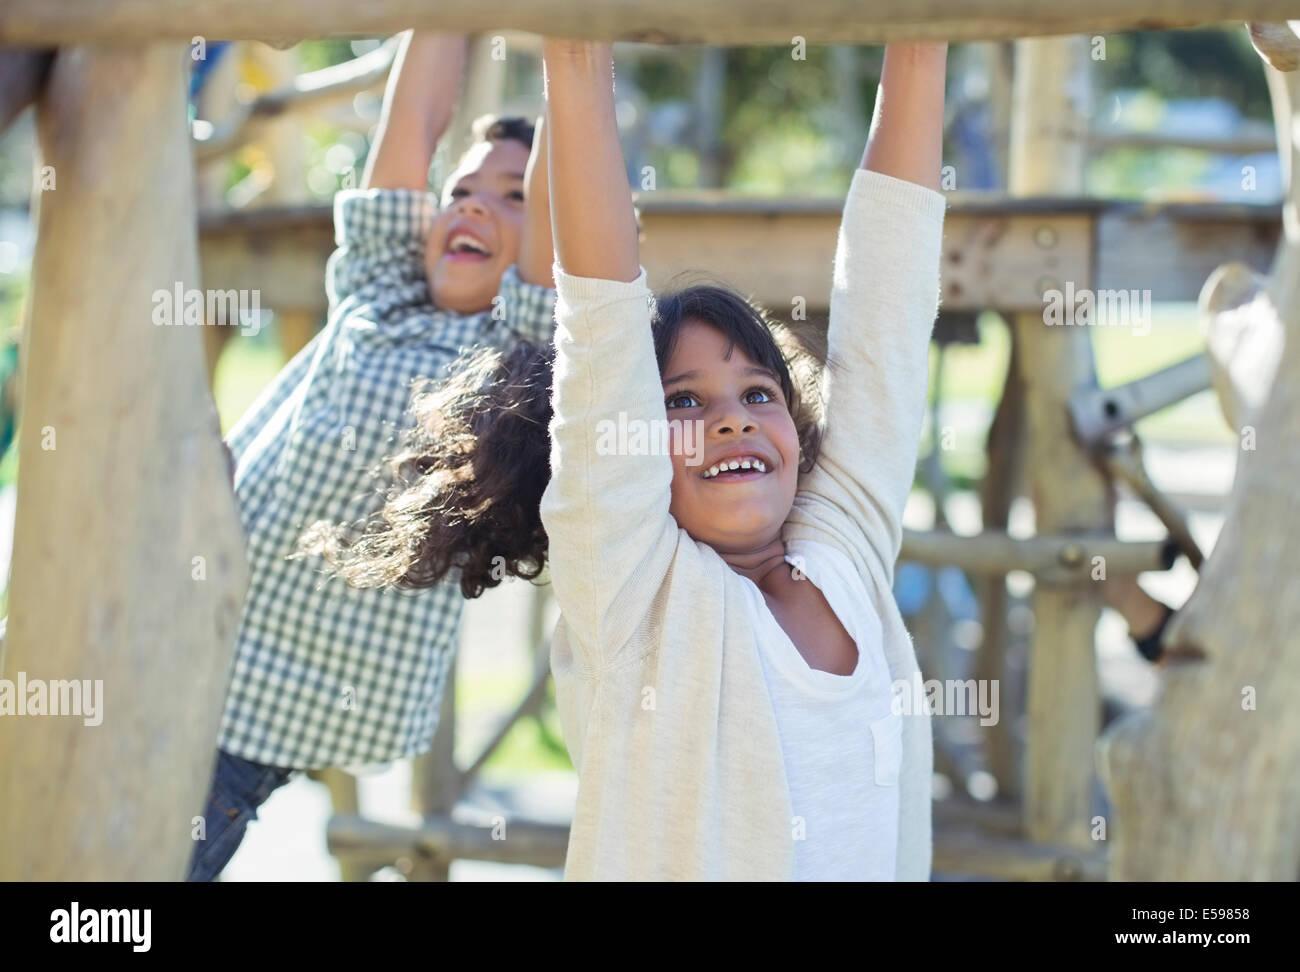 Children climbing on monkey bars - Stock Image